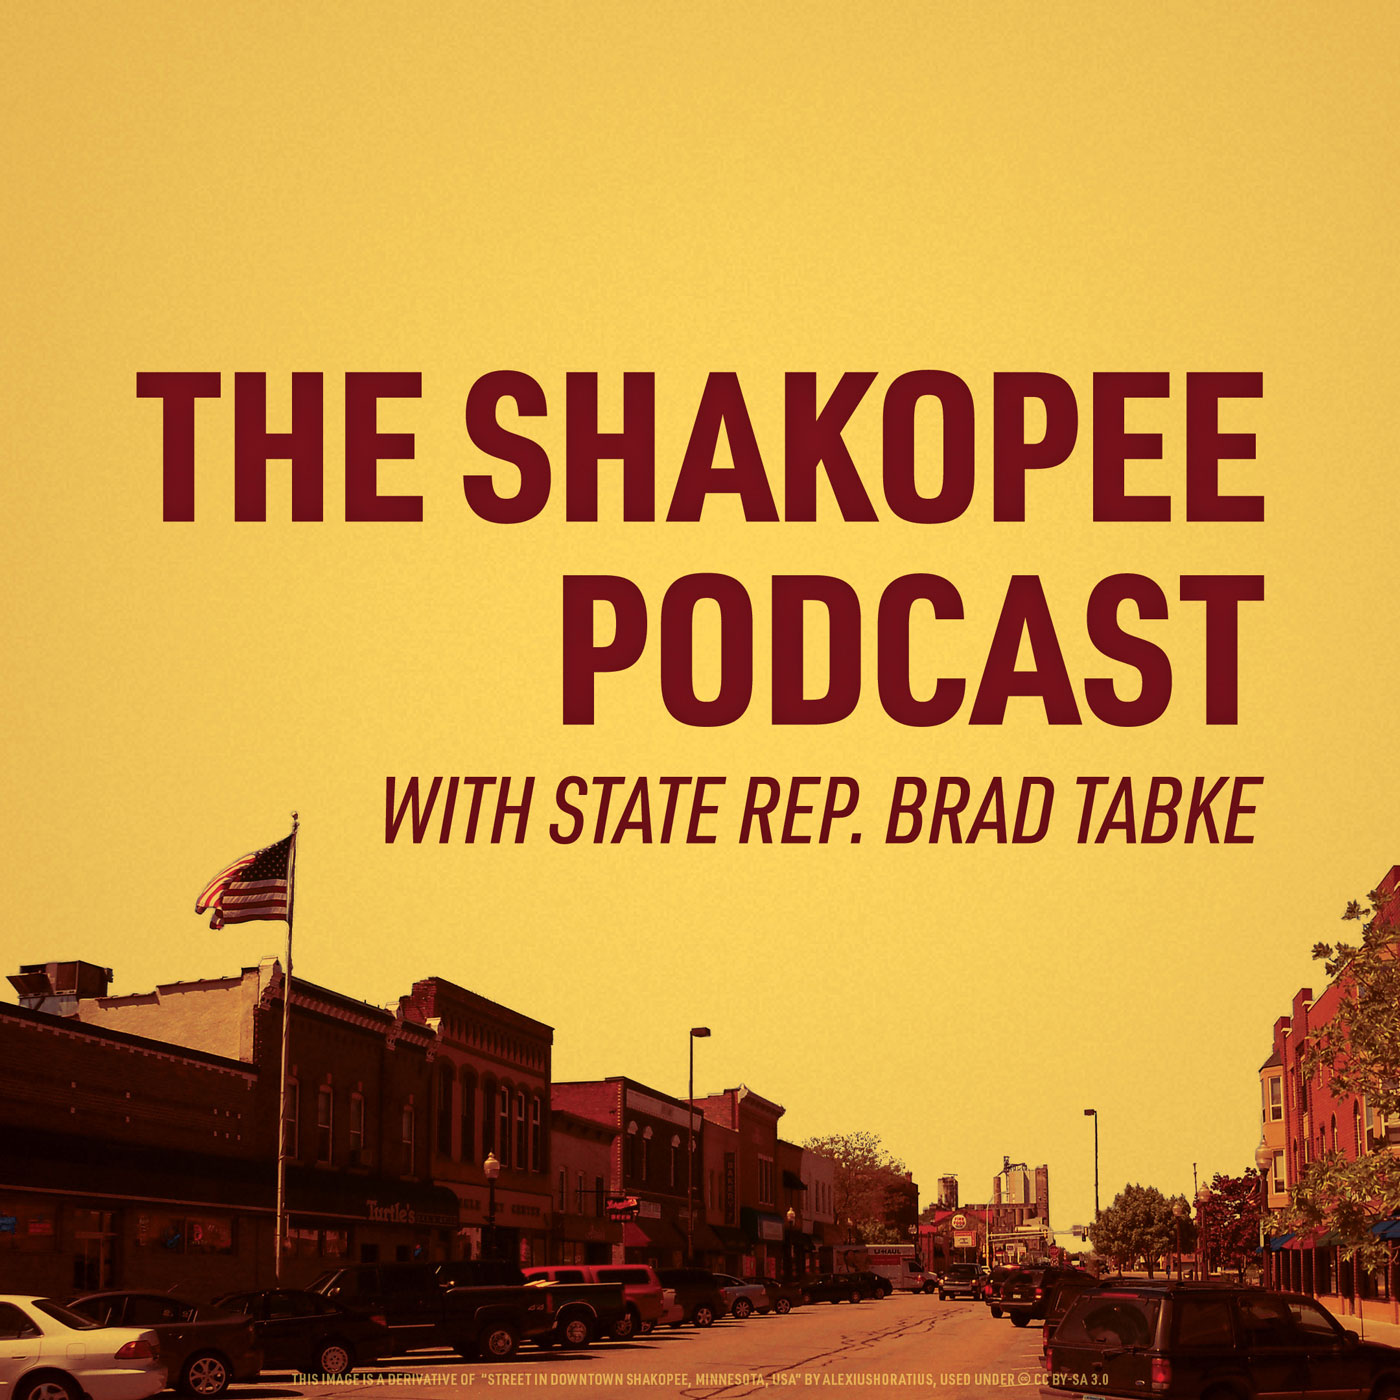 The Shakopee Podcast